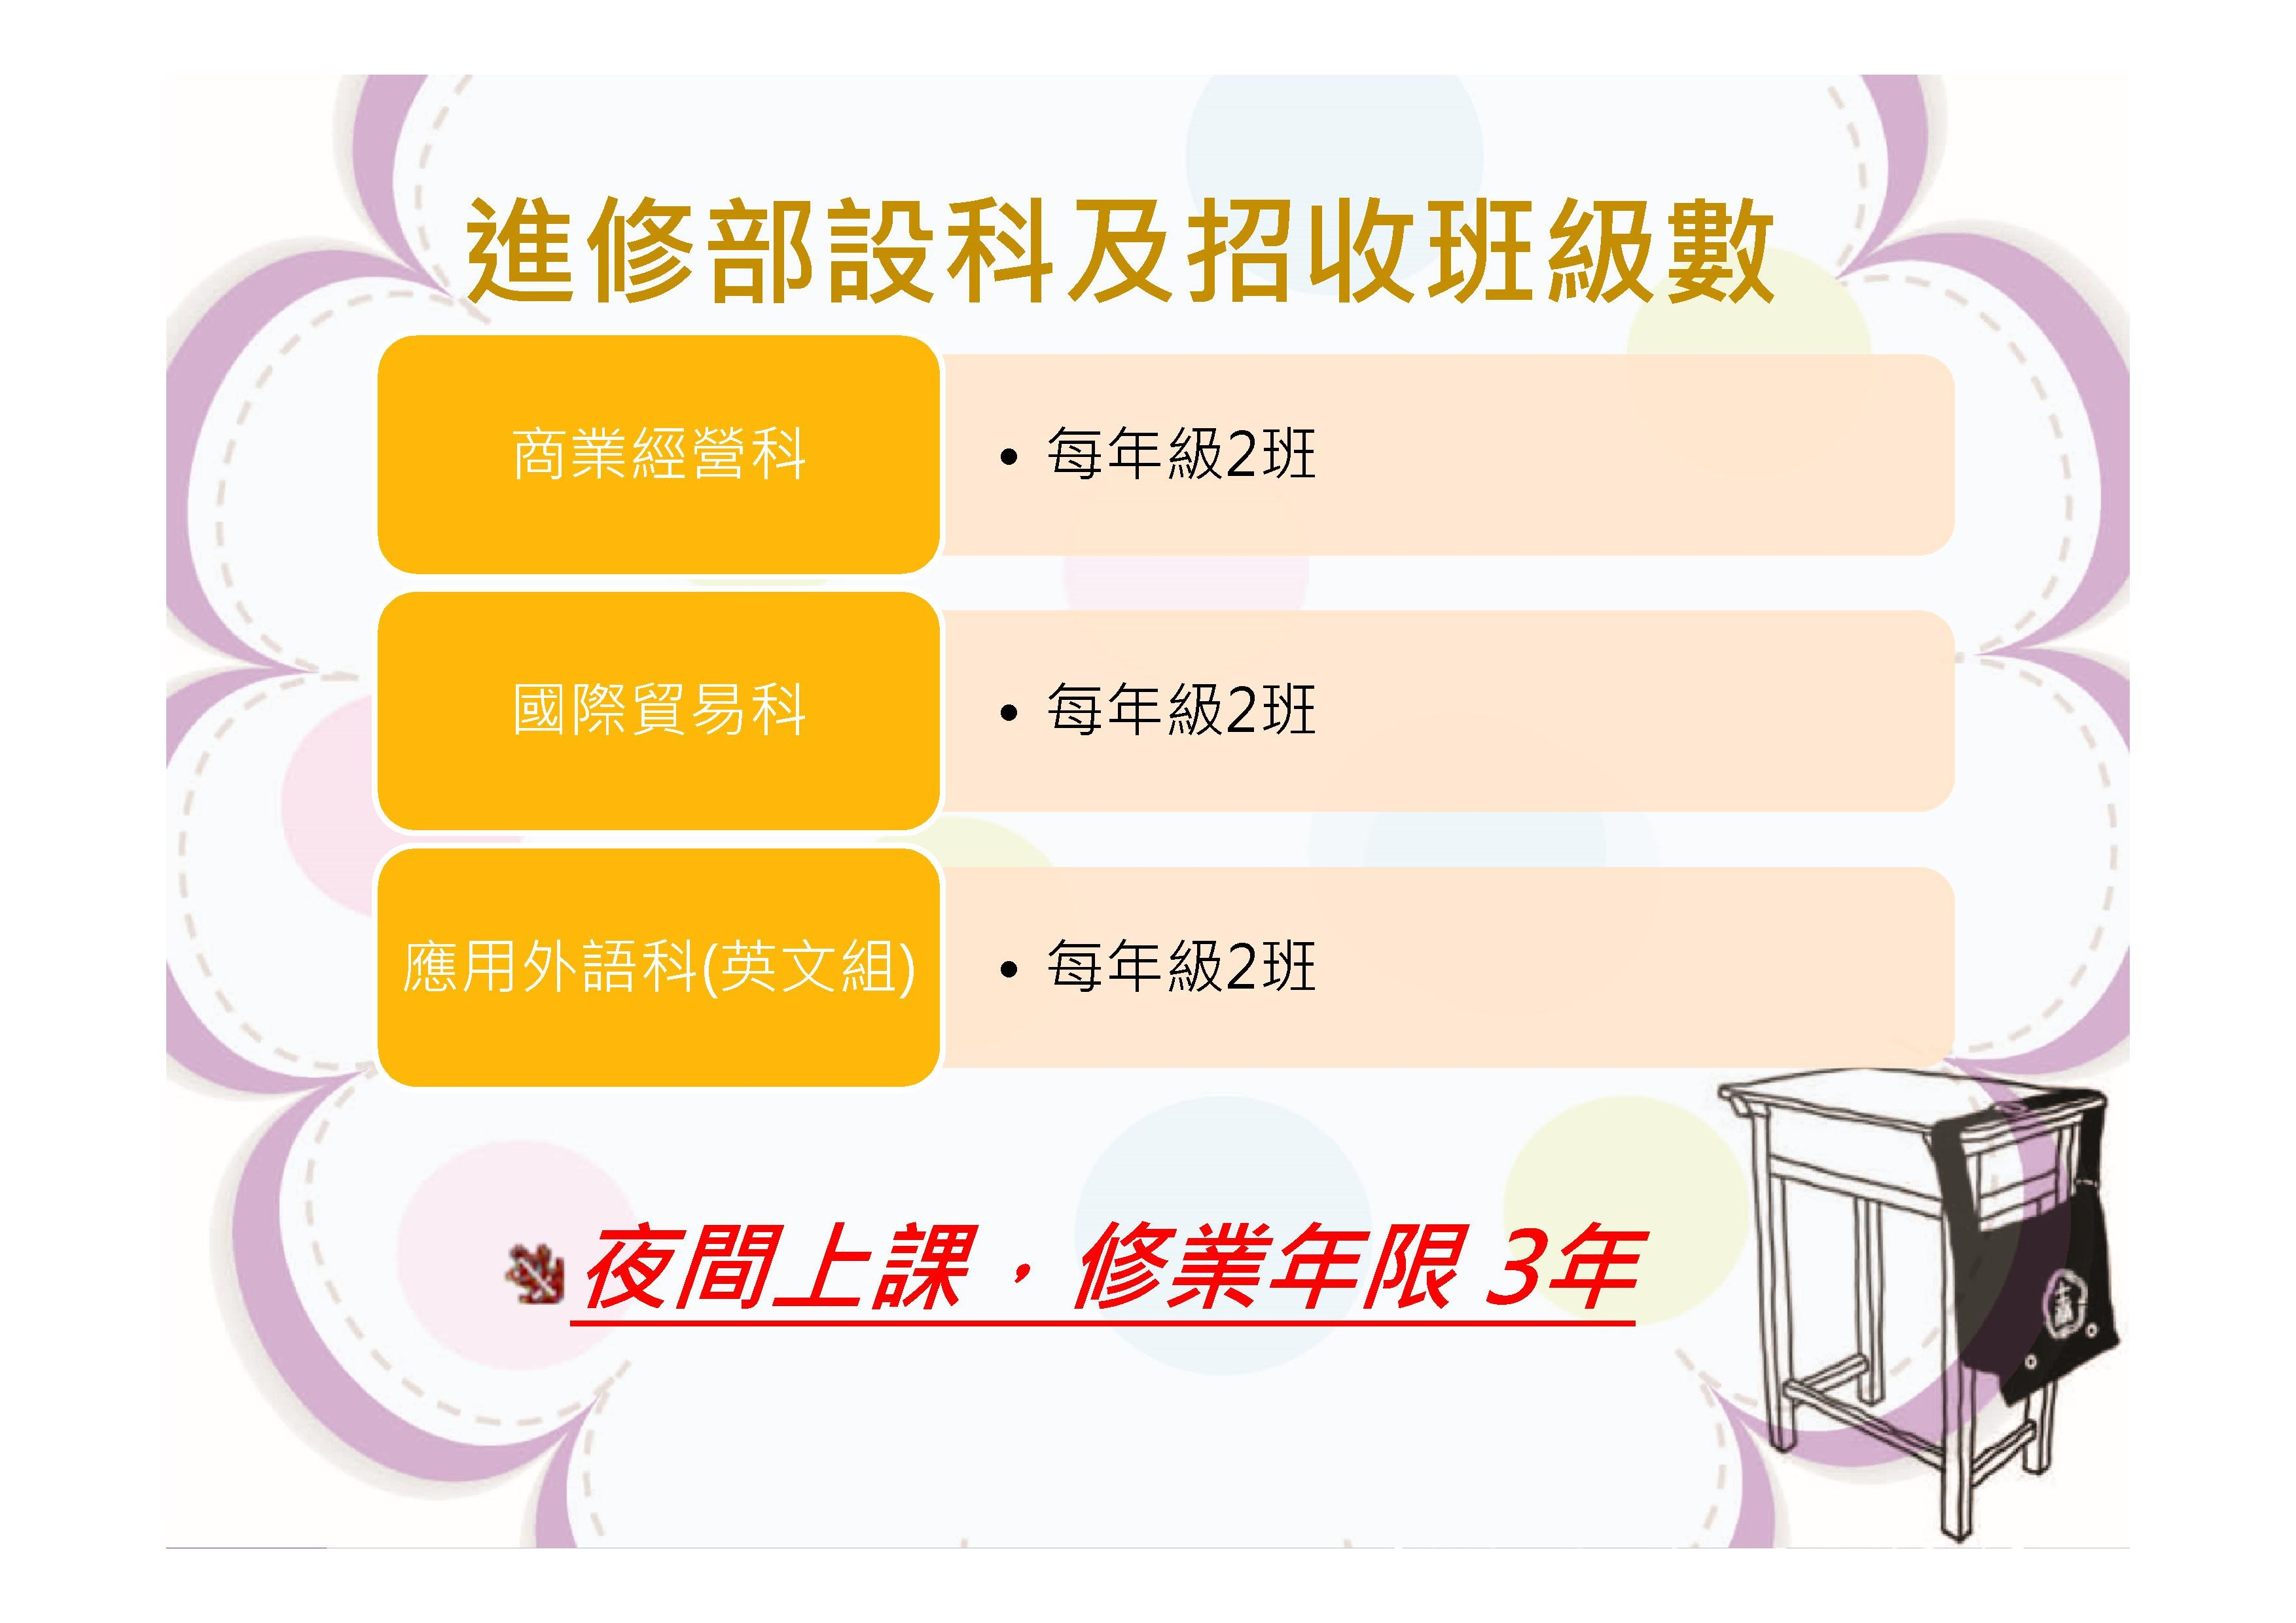 Microsoft PowerPoint - 技職教育暨士商簡介.pptx00012